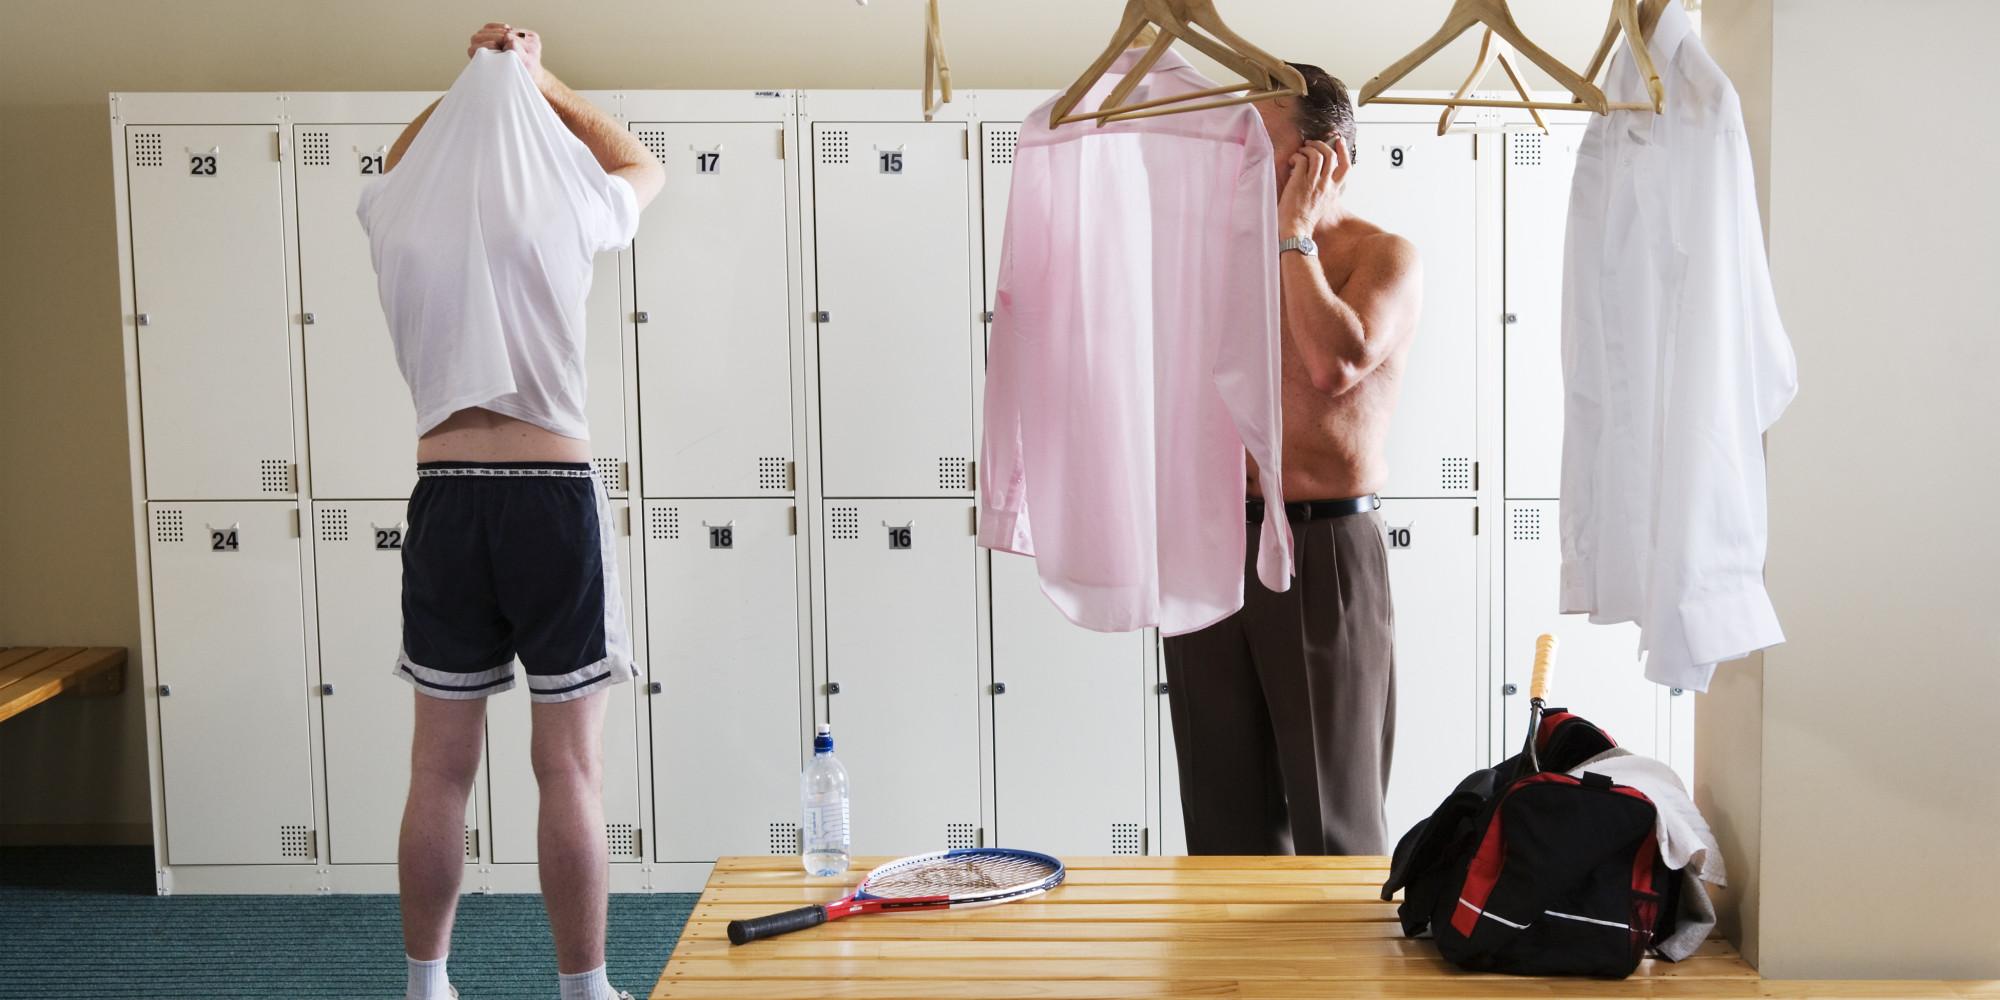 naked male in locker room